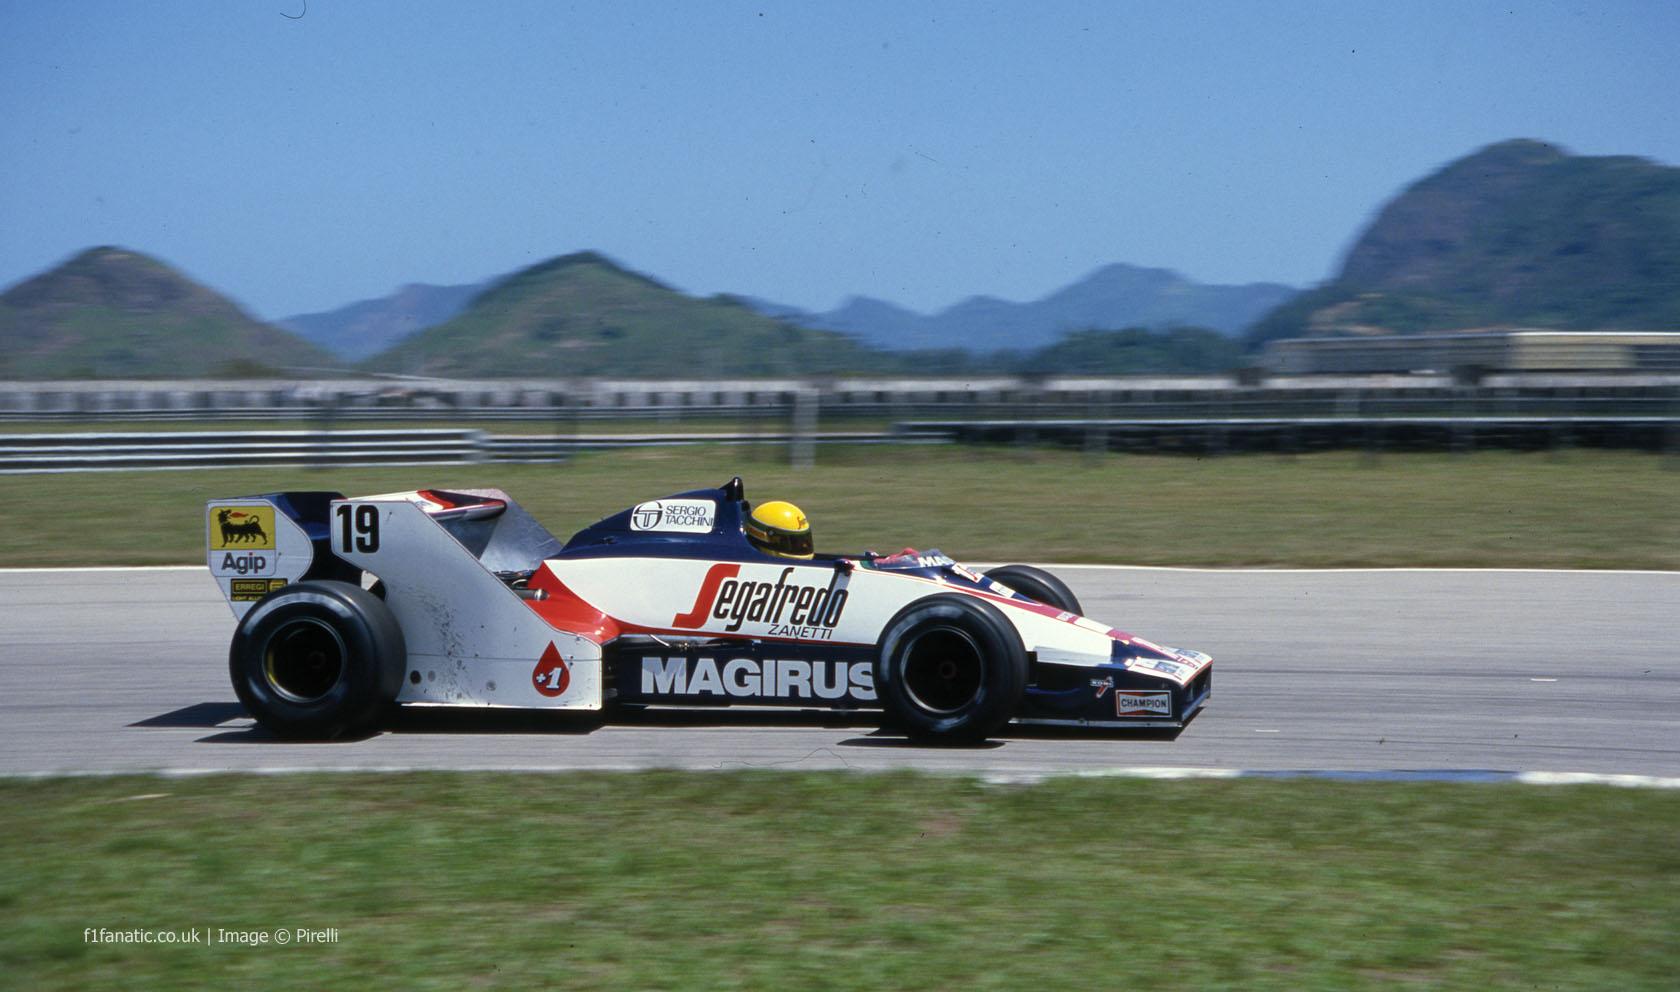 Ayrton Senna Toleman Jacarepagua 1984 183 F1 Fanatic